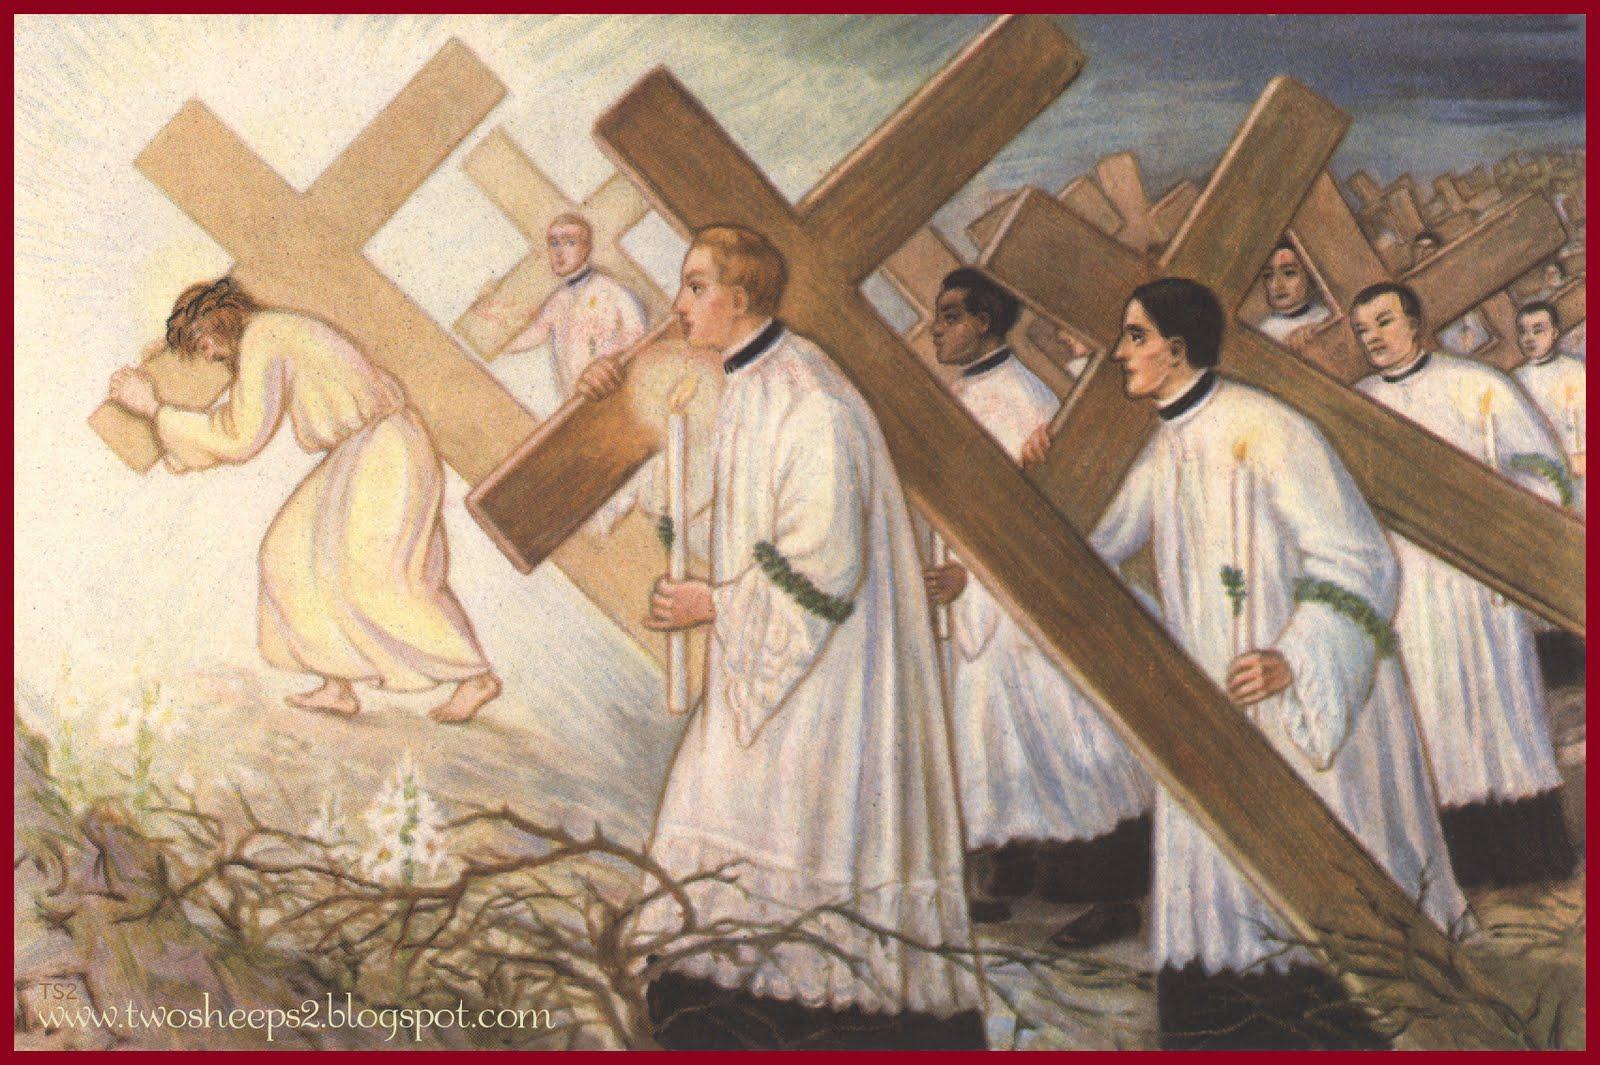 The catholic jedi academy pray pray for prieststan hates them satan hates them buycottarizona